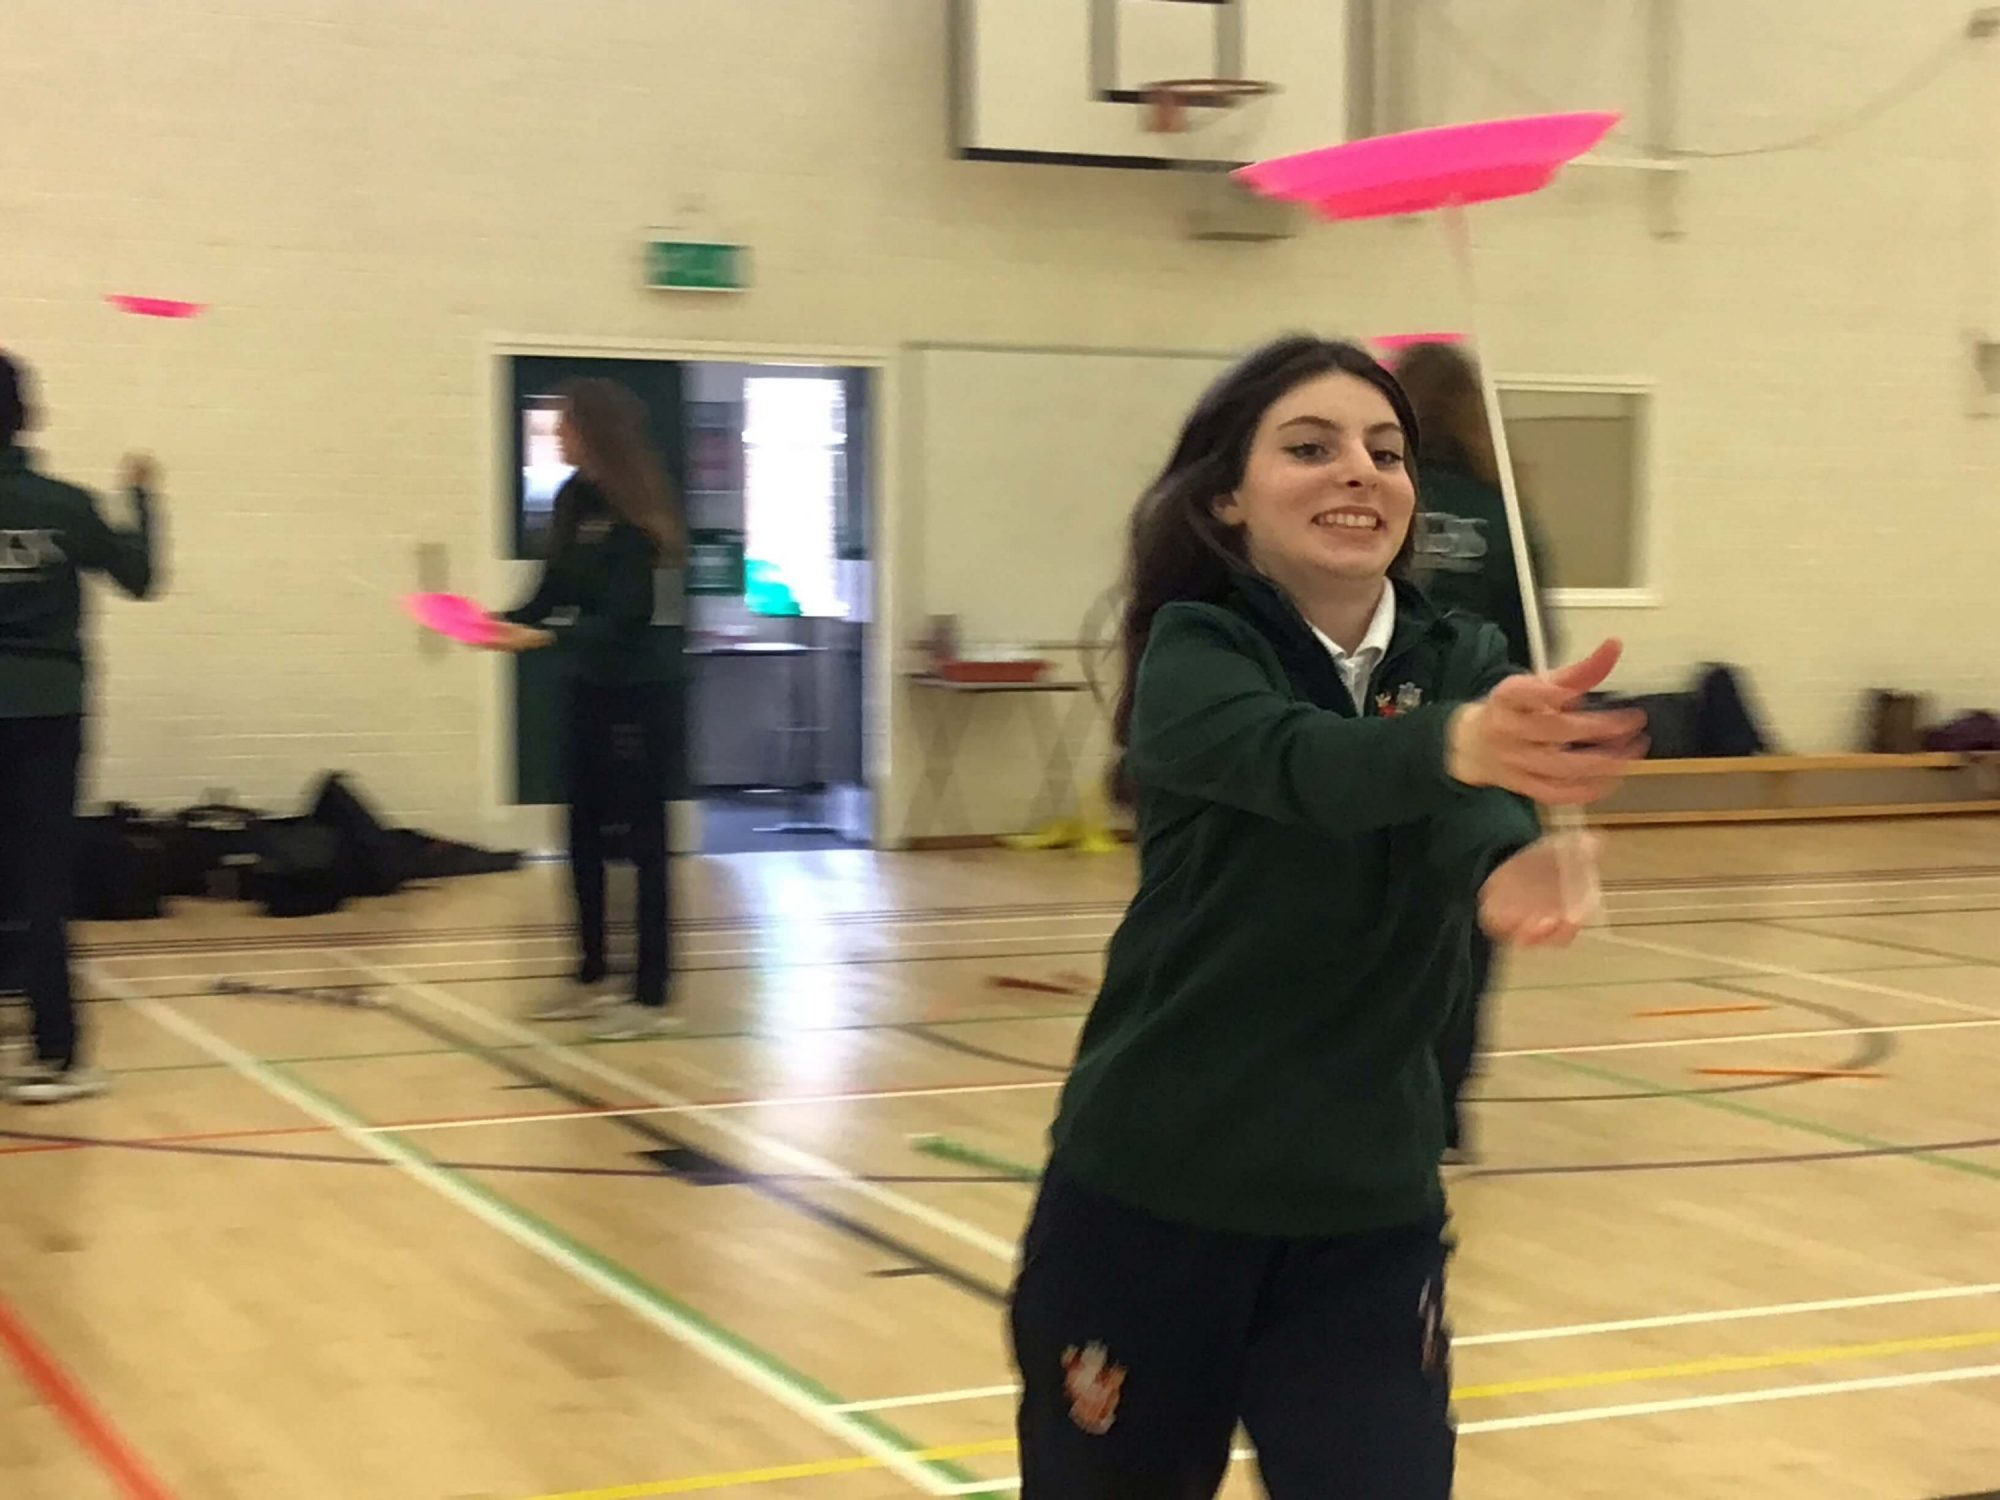 Circus skills!